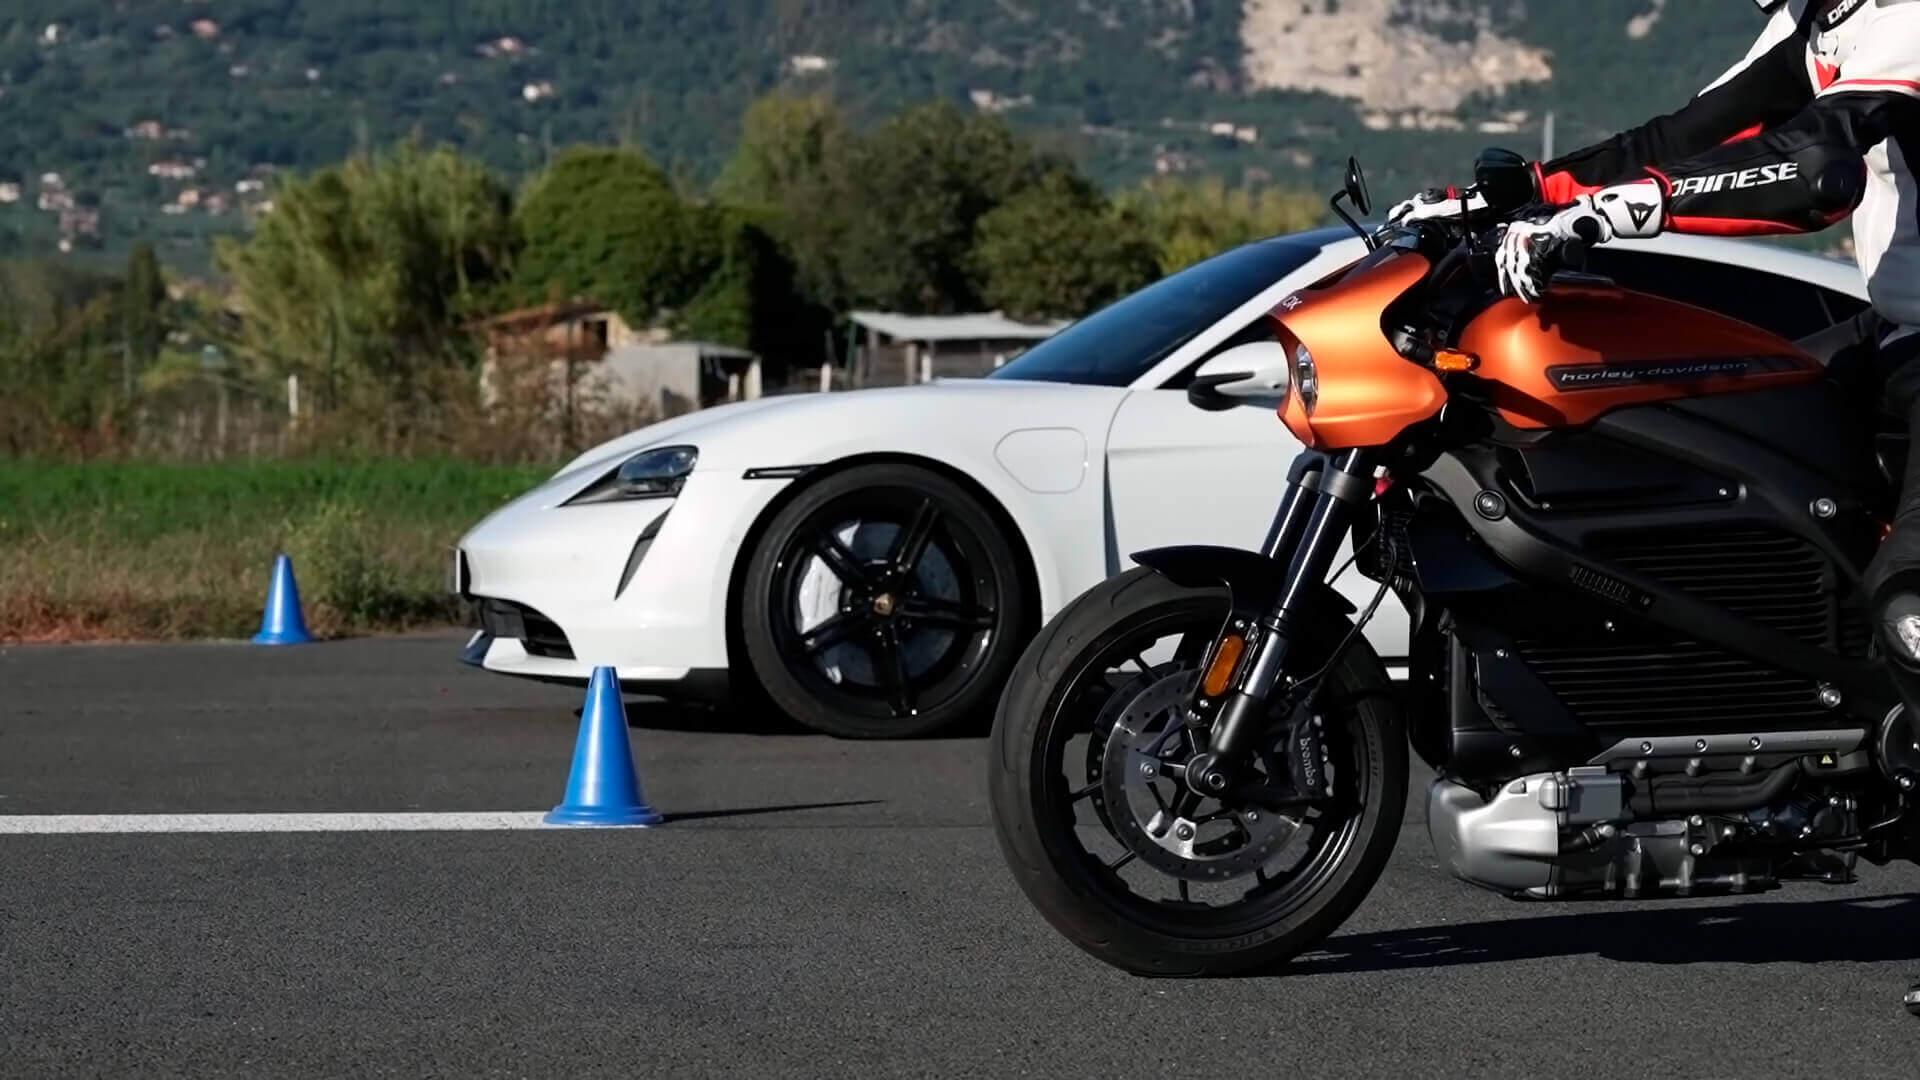 Гонка на ¼ мили между Porsche Taycan Turbo и Harley-Davidson LiveWire